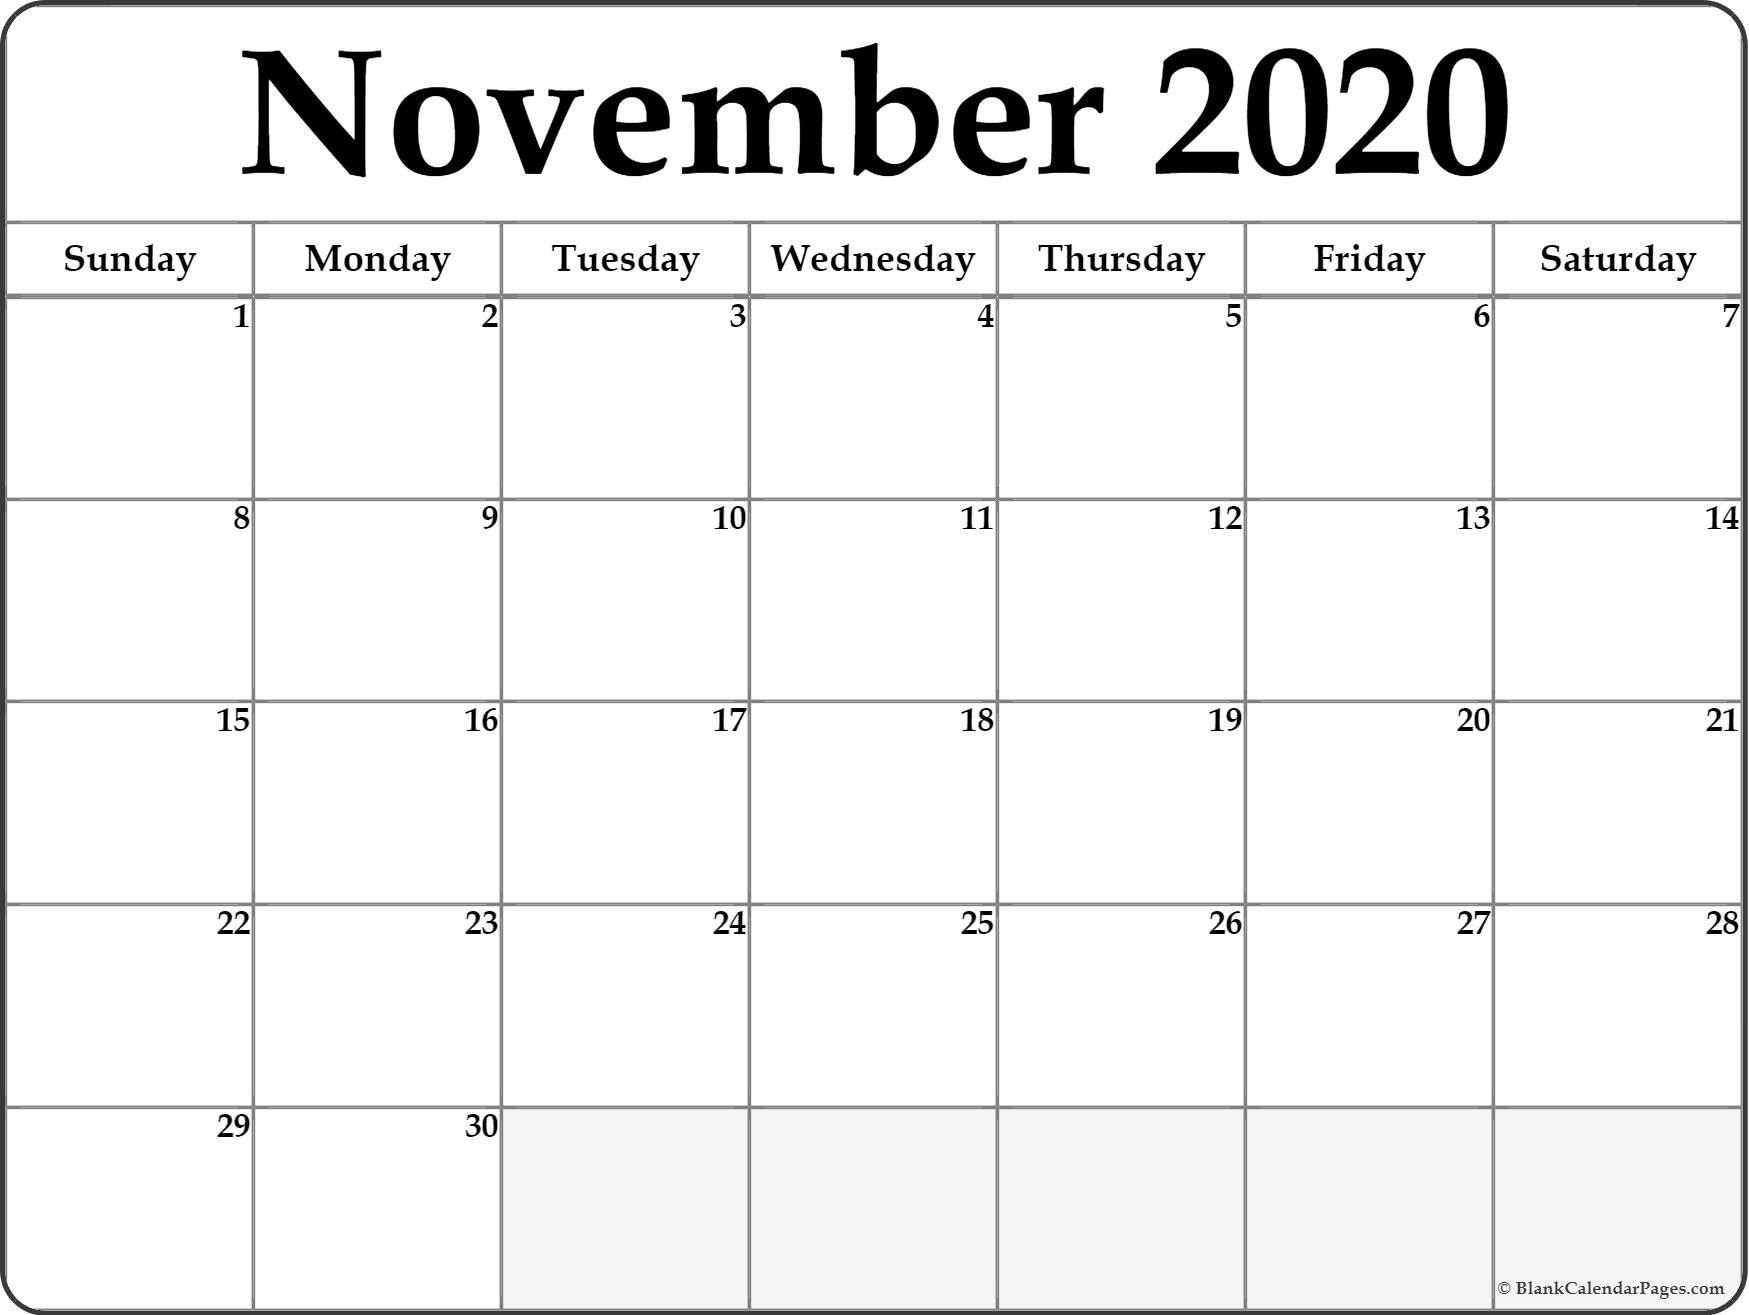 006 Outstanding Printable Calendar Template November 2020 Image  FreeFull